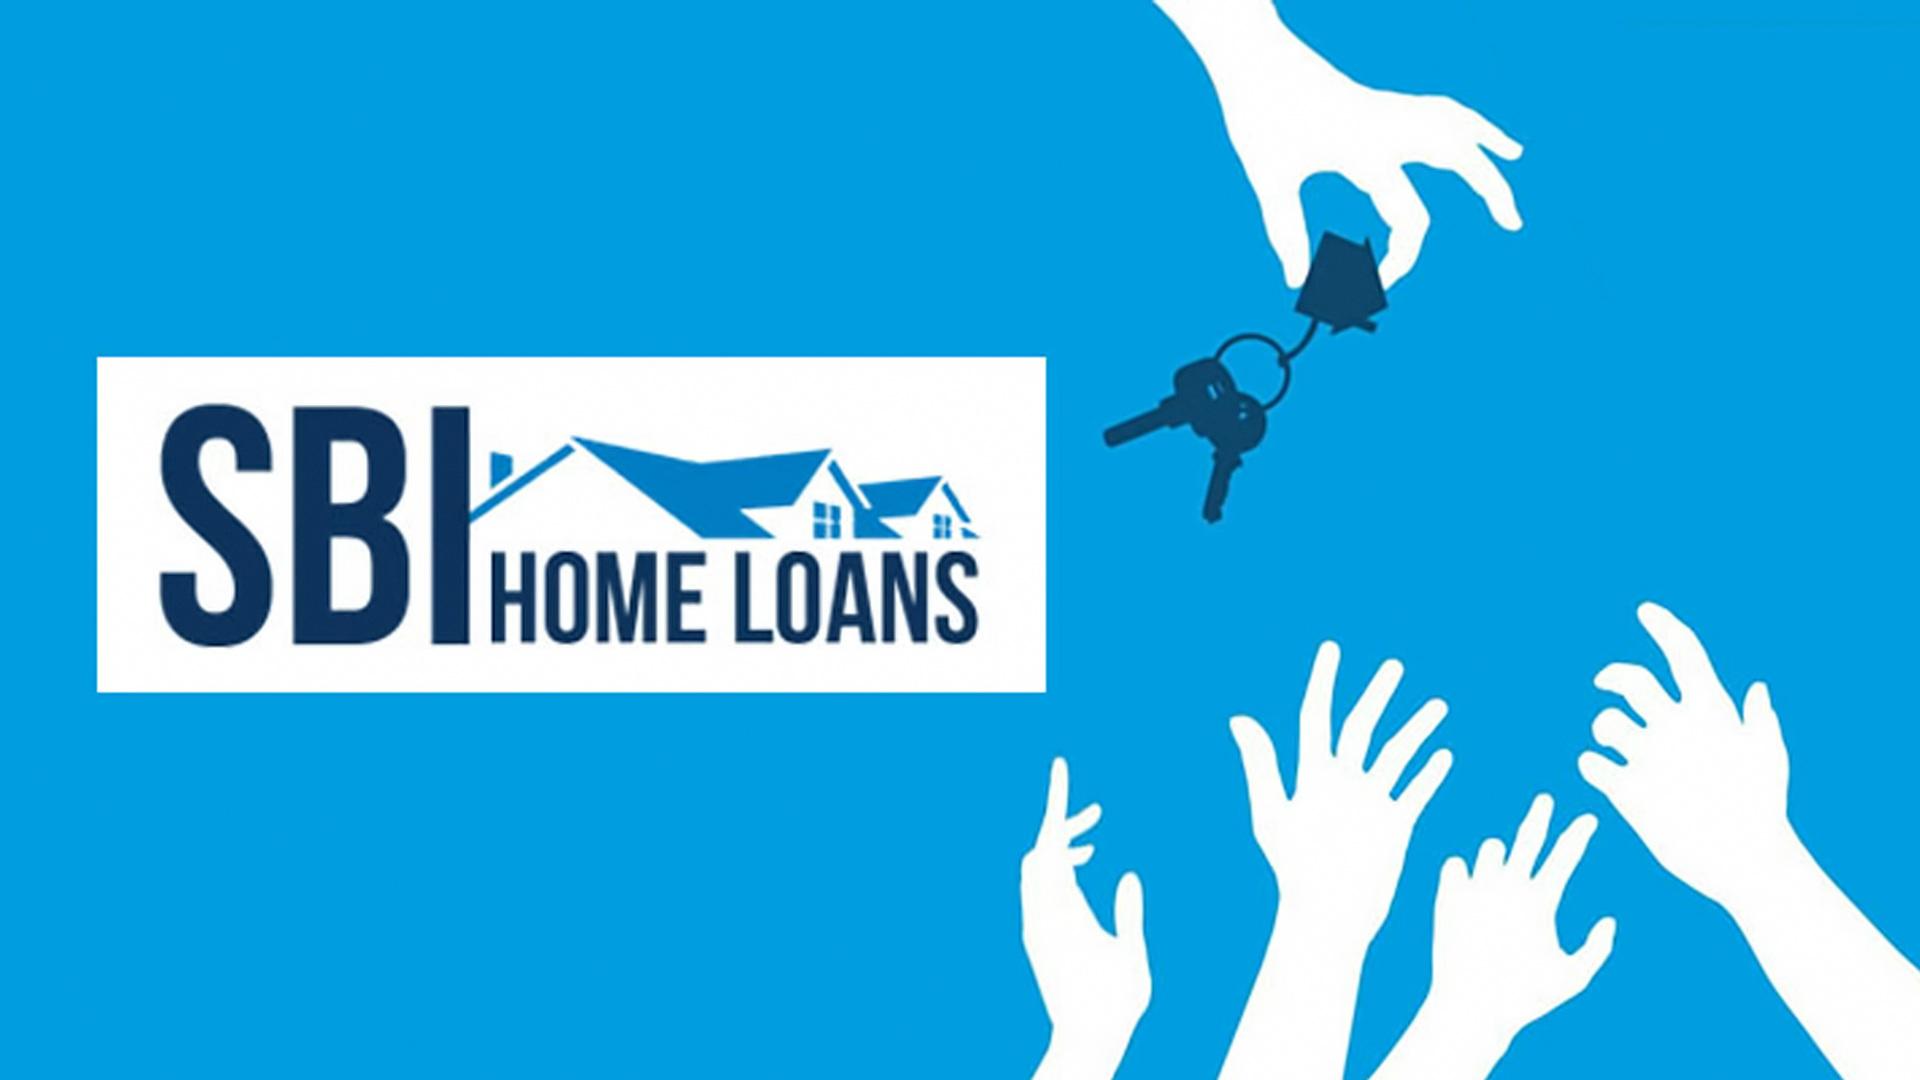 SBI-Home-loans.jpg